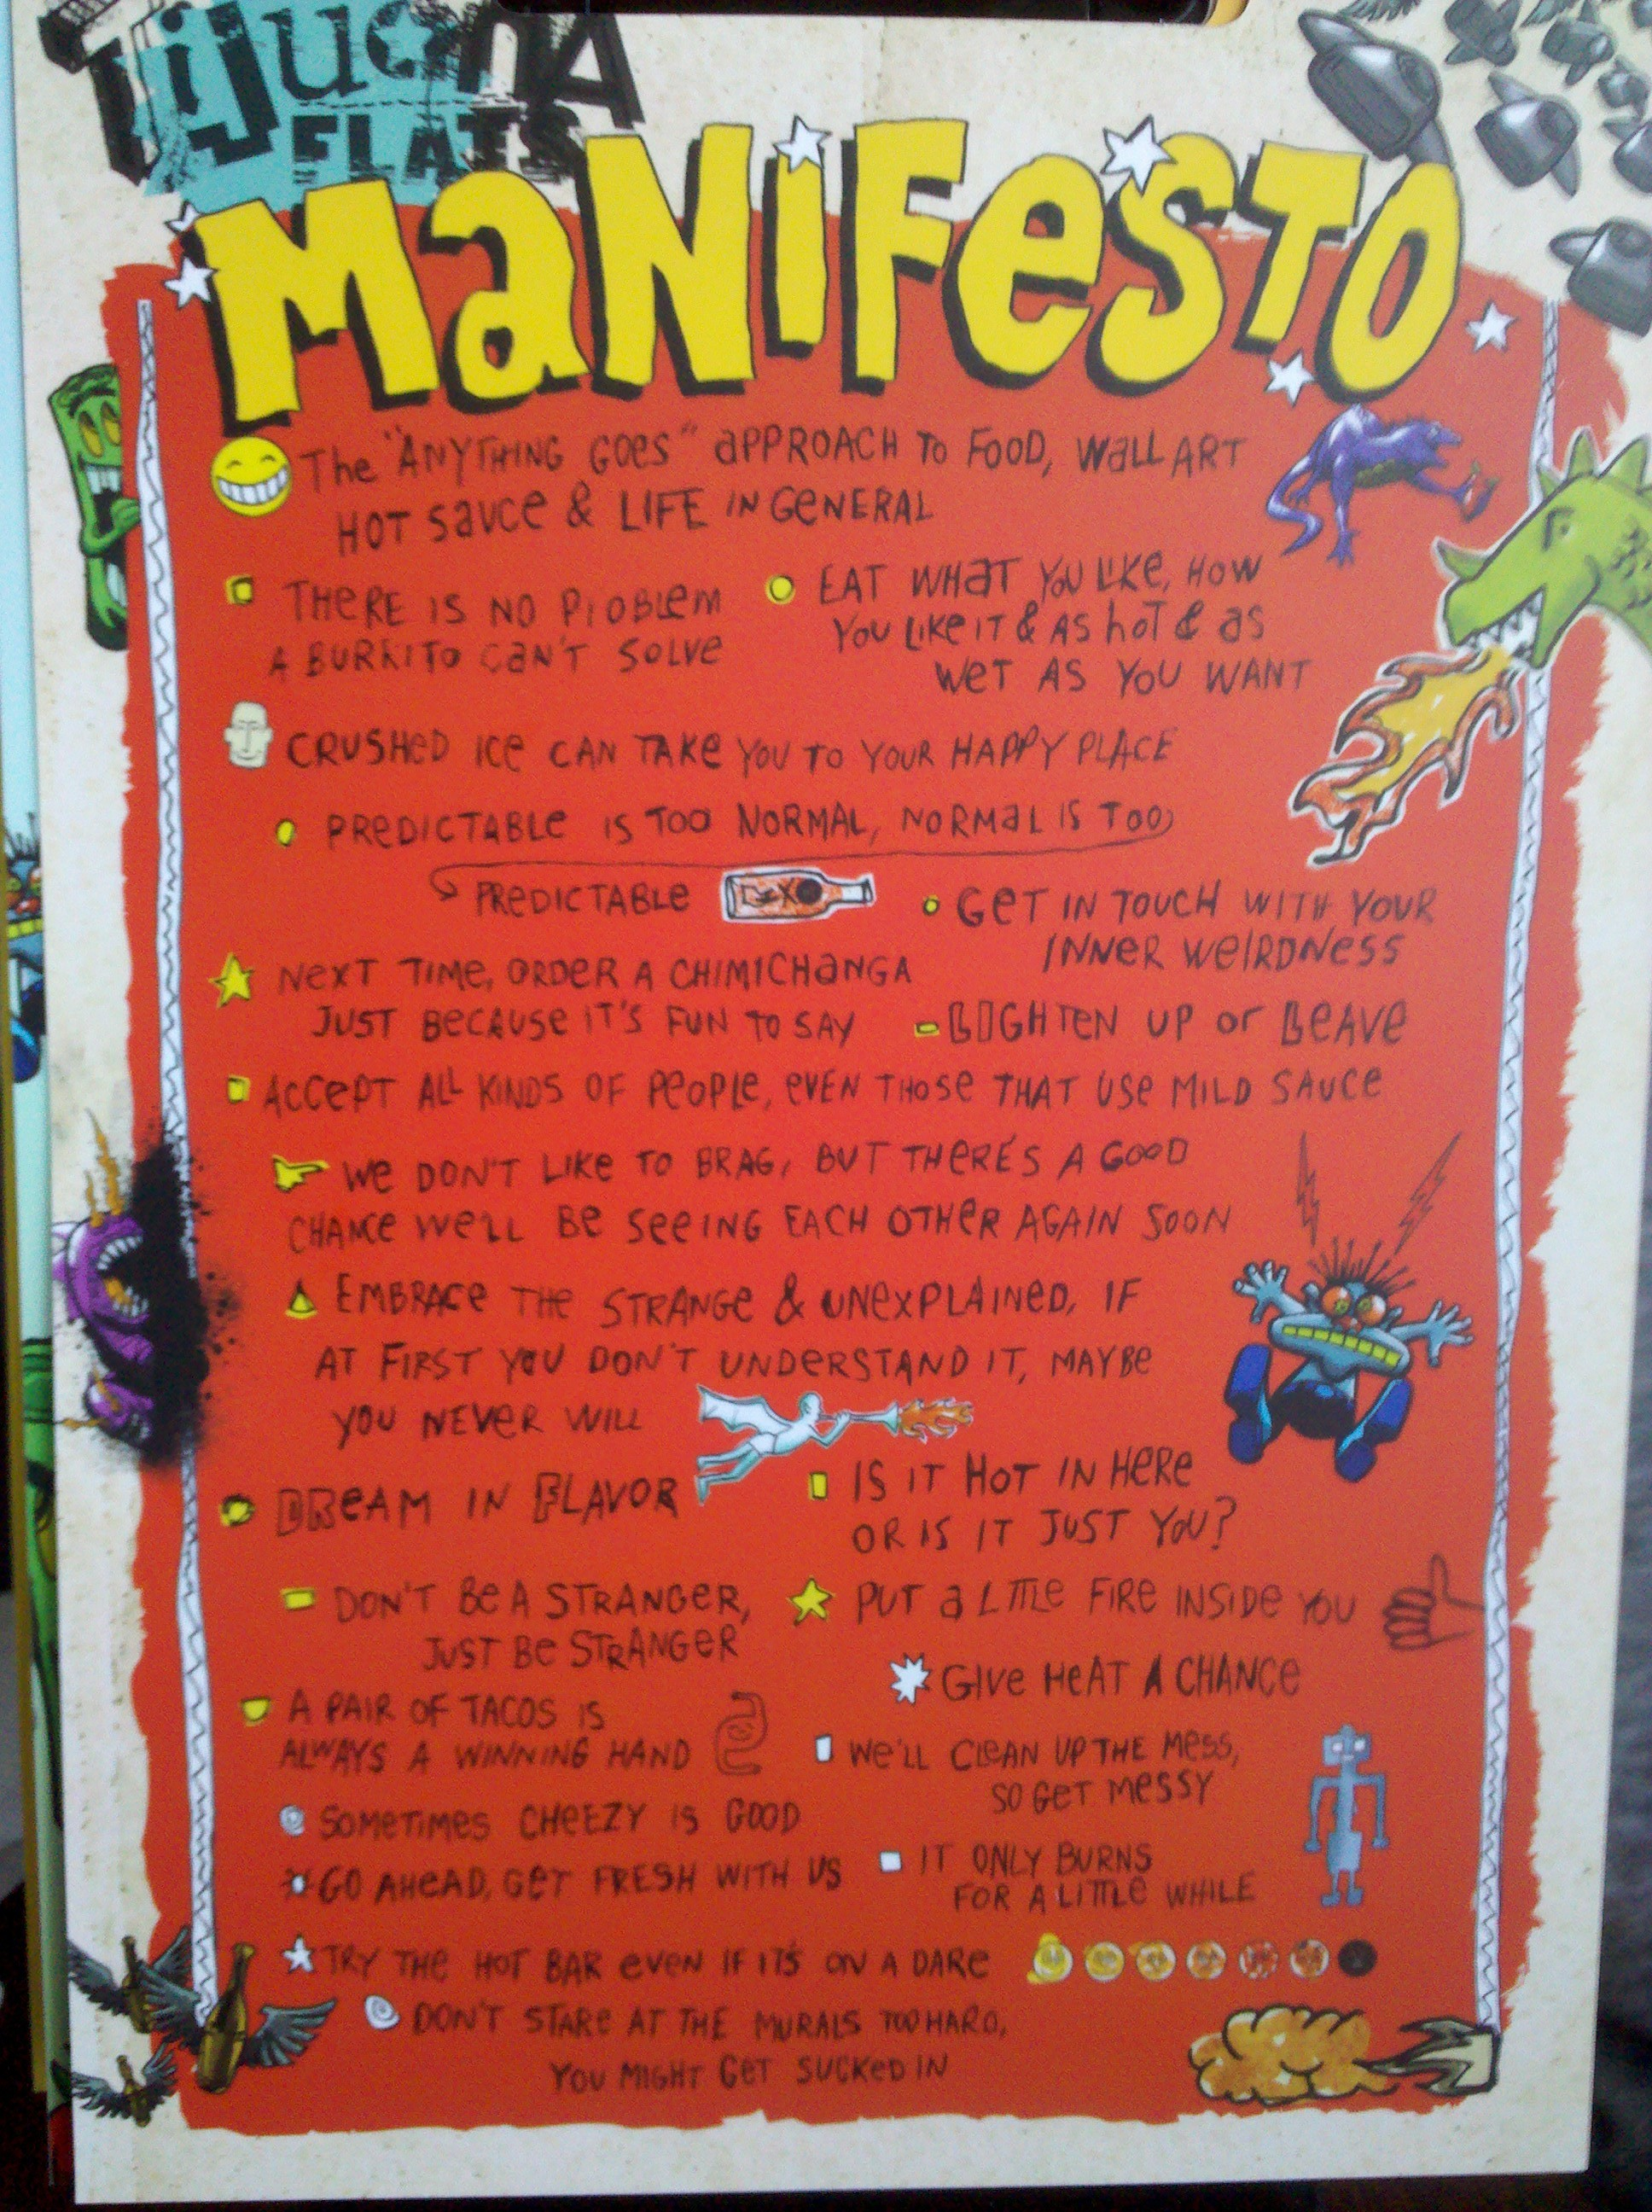 Tijuana Flats manifesto